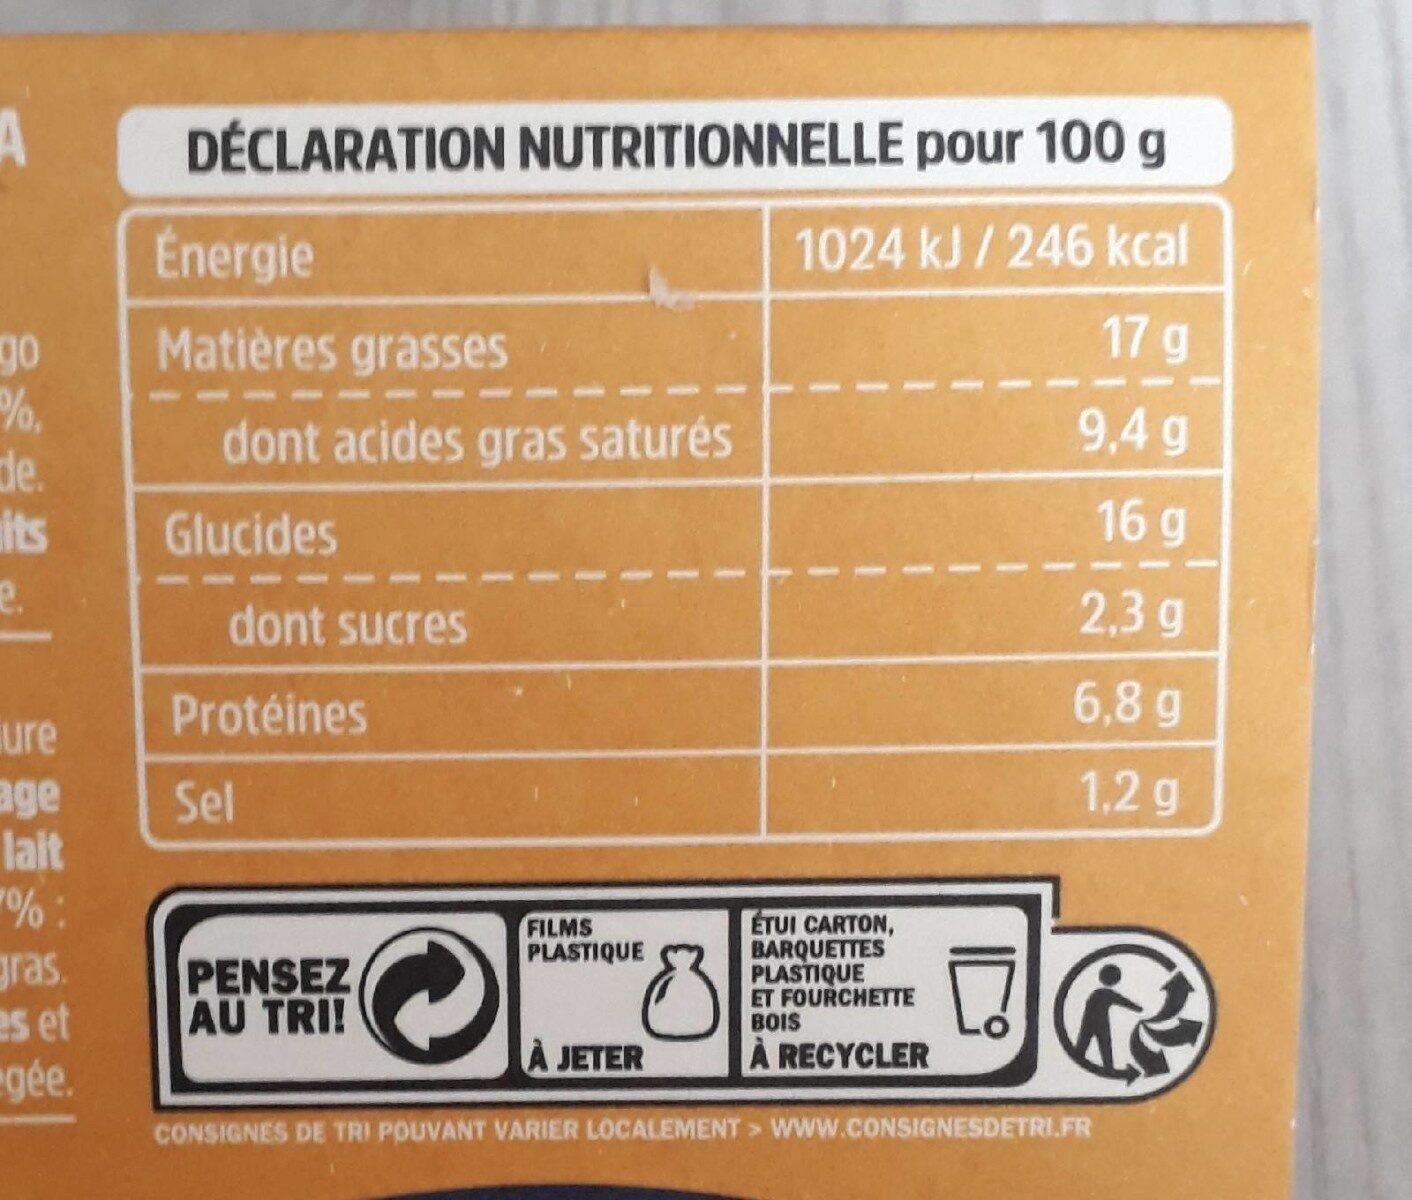 Tortellini ricotta & épinards aux fromages - Nutrition facts - fr